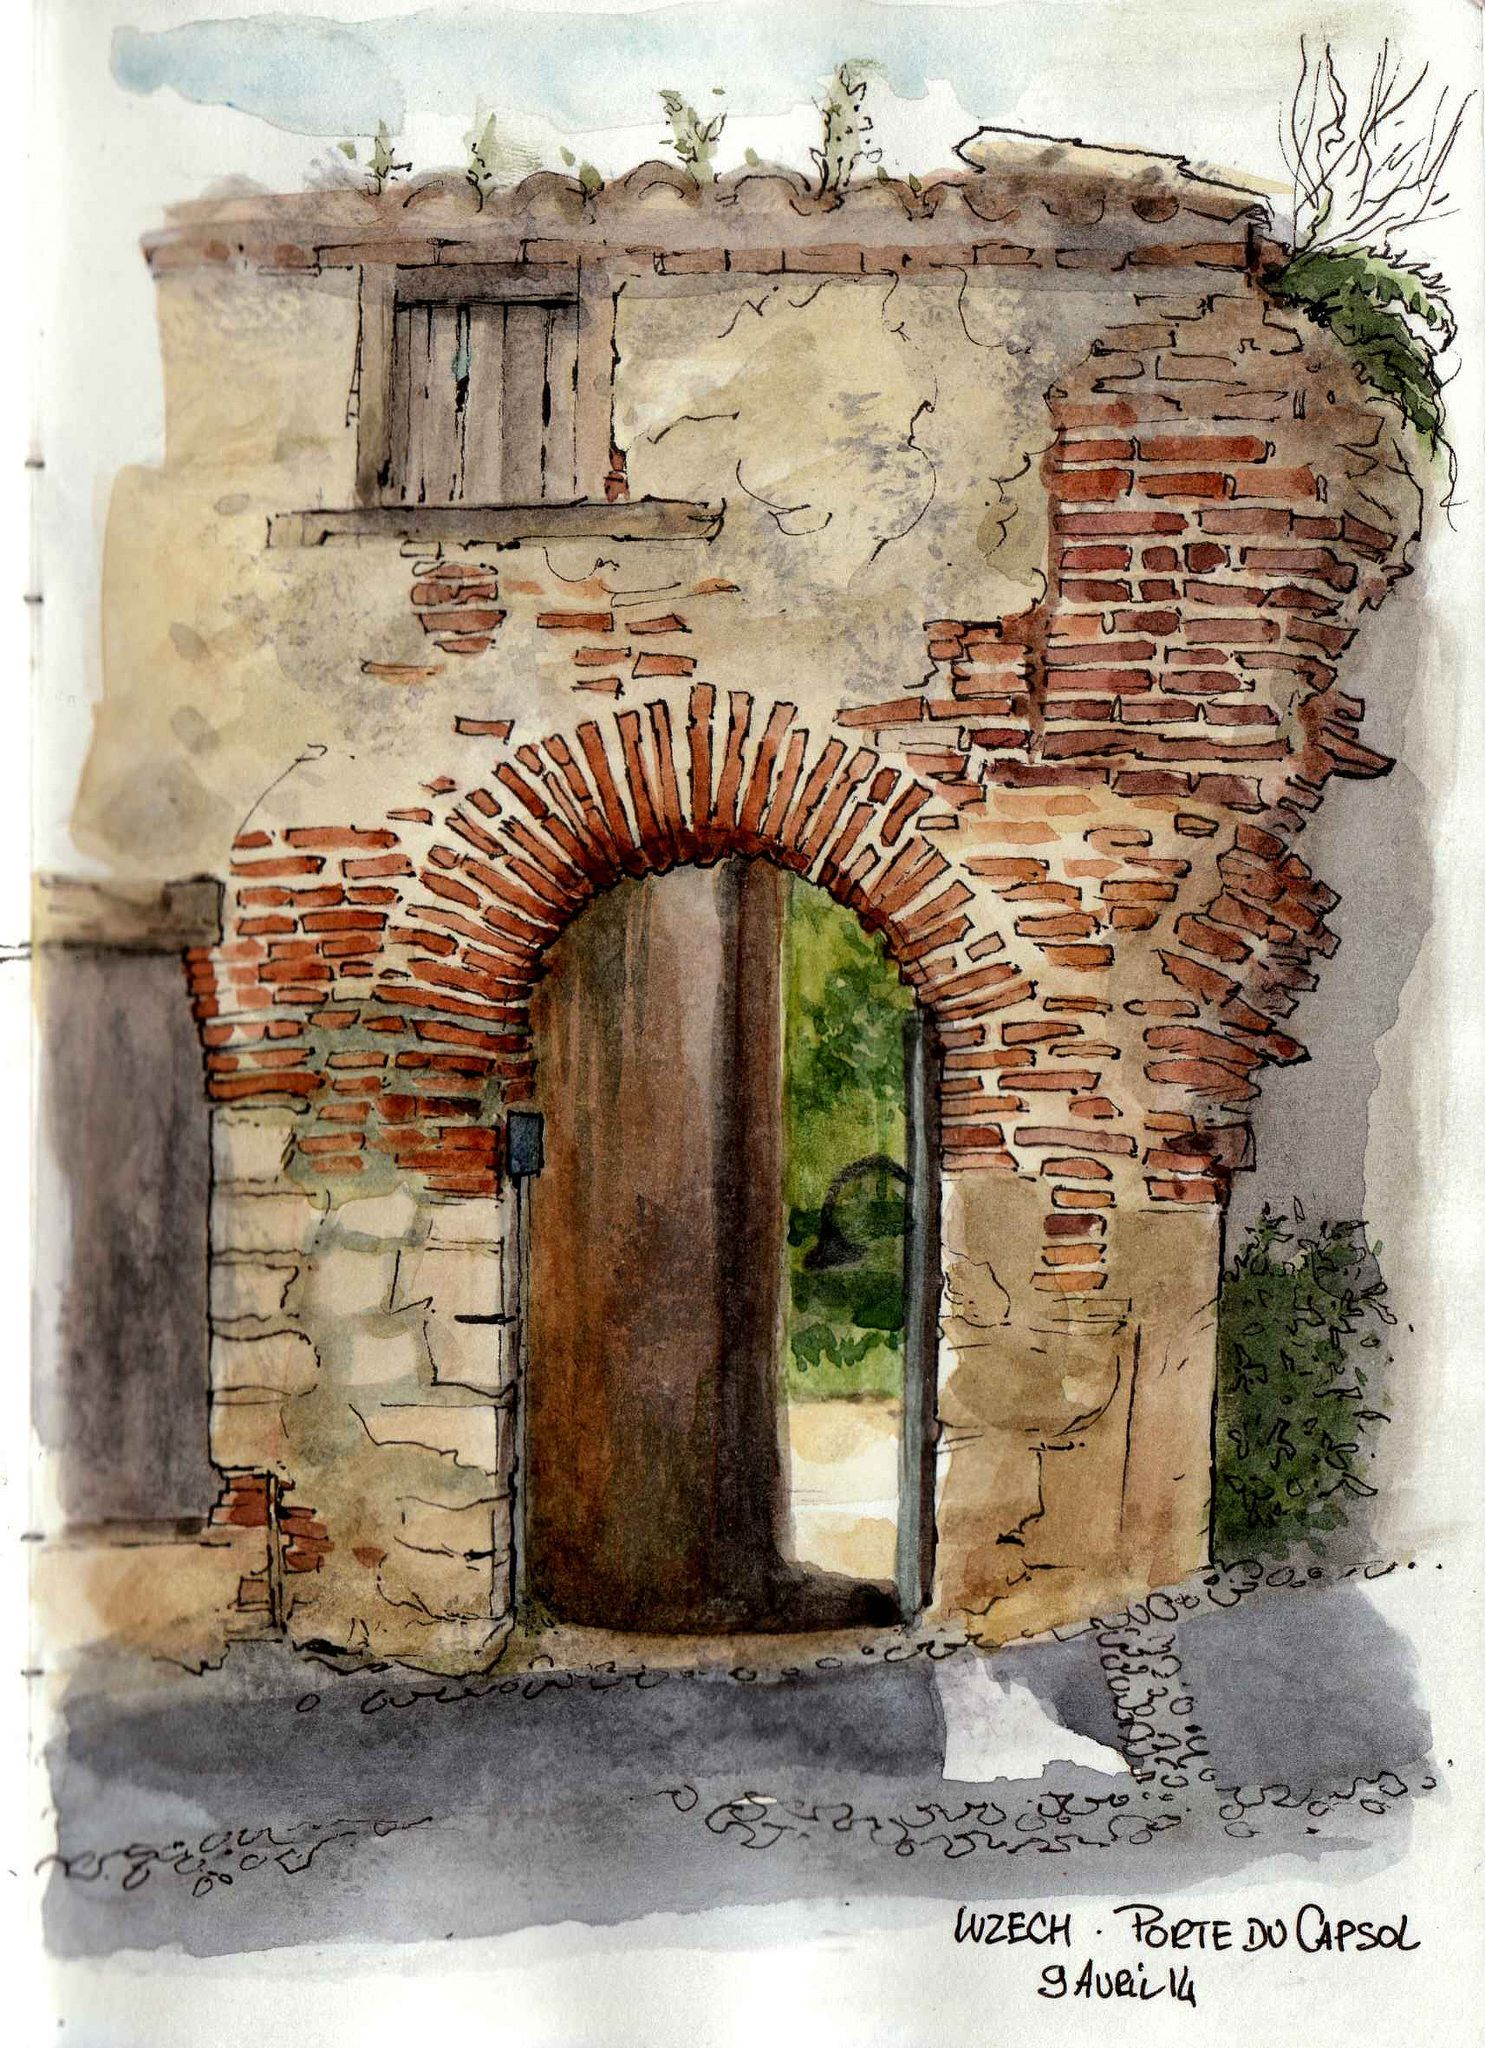 La porte du capsol une taxe encore aquarell for Architektur aquarell